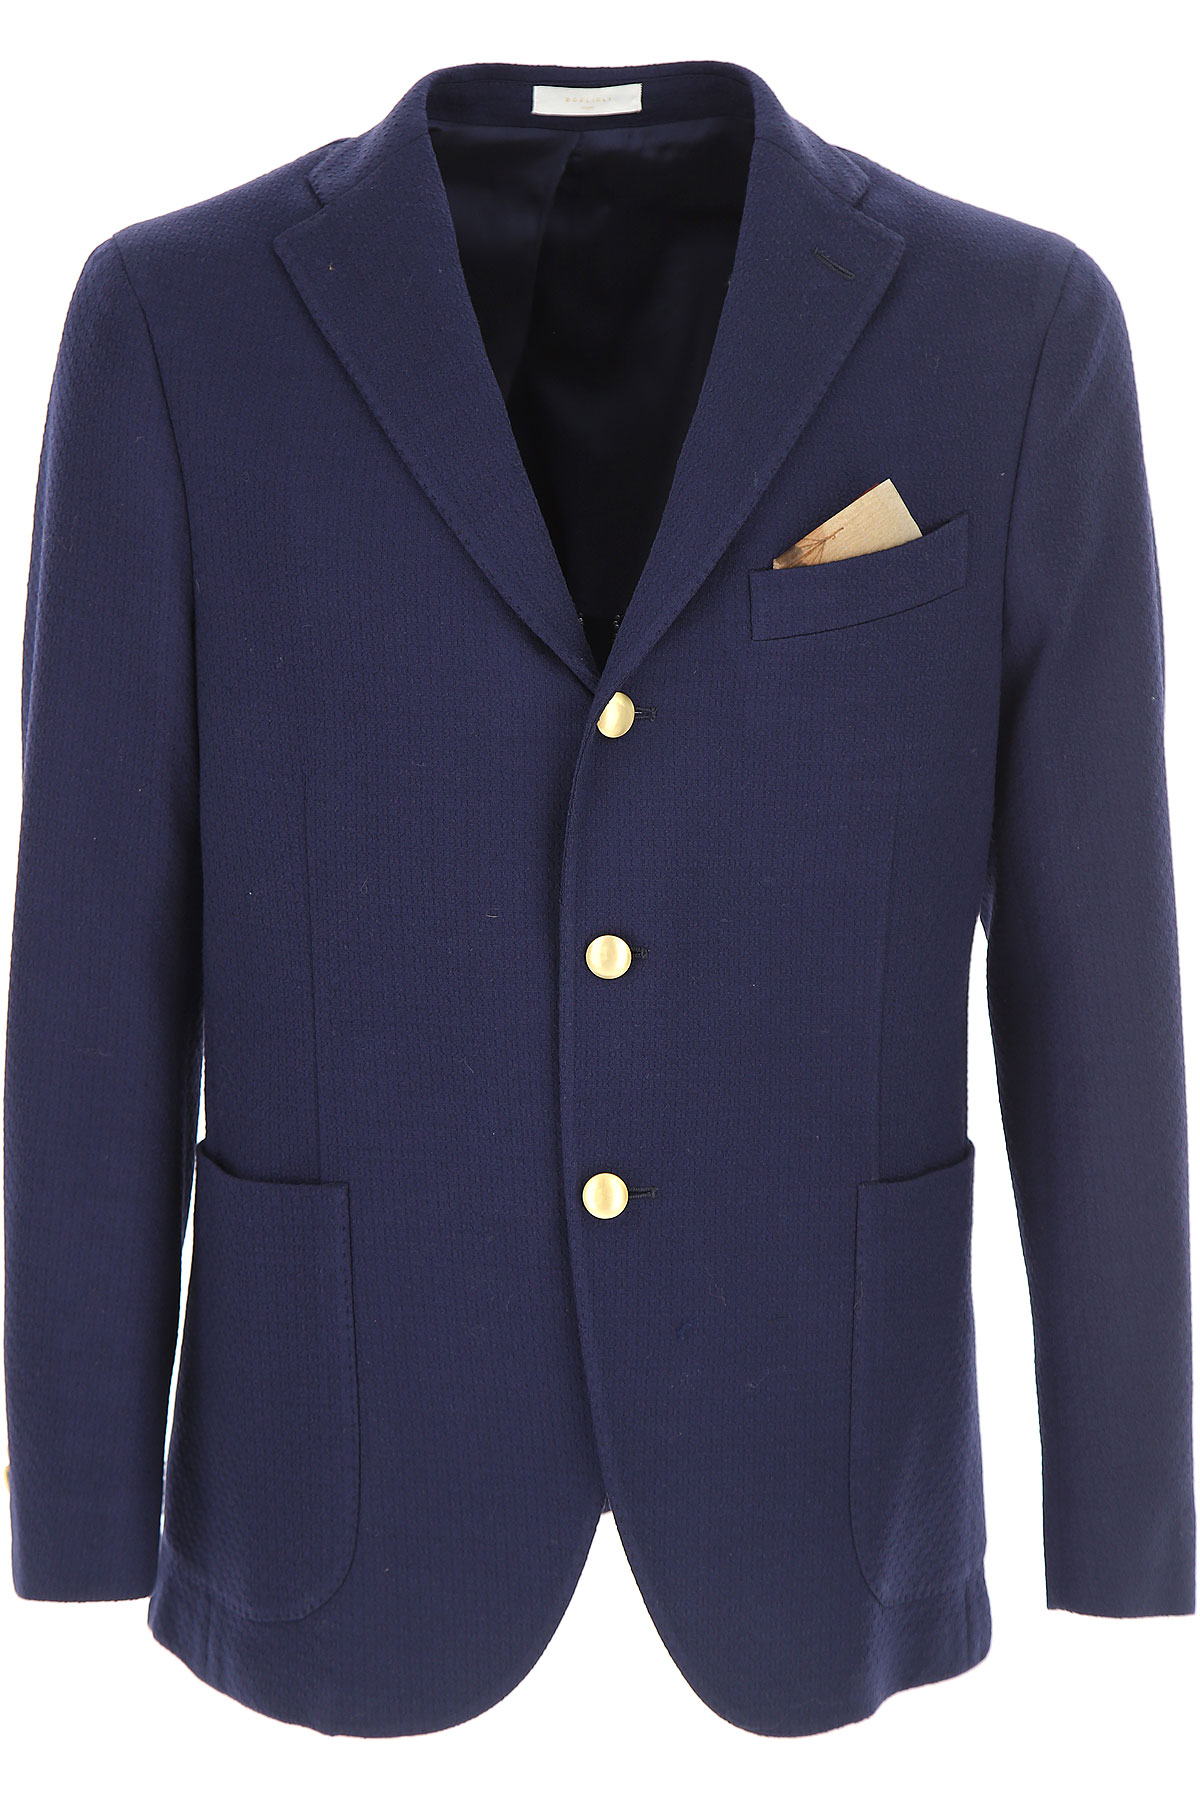 Boglioli Blazer Homme, Veste Sport, Bleu marine, Coton, 2017, L XL XXL